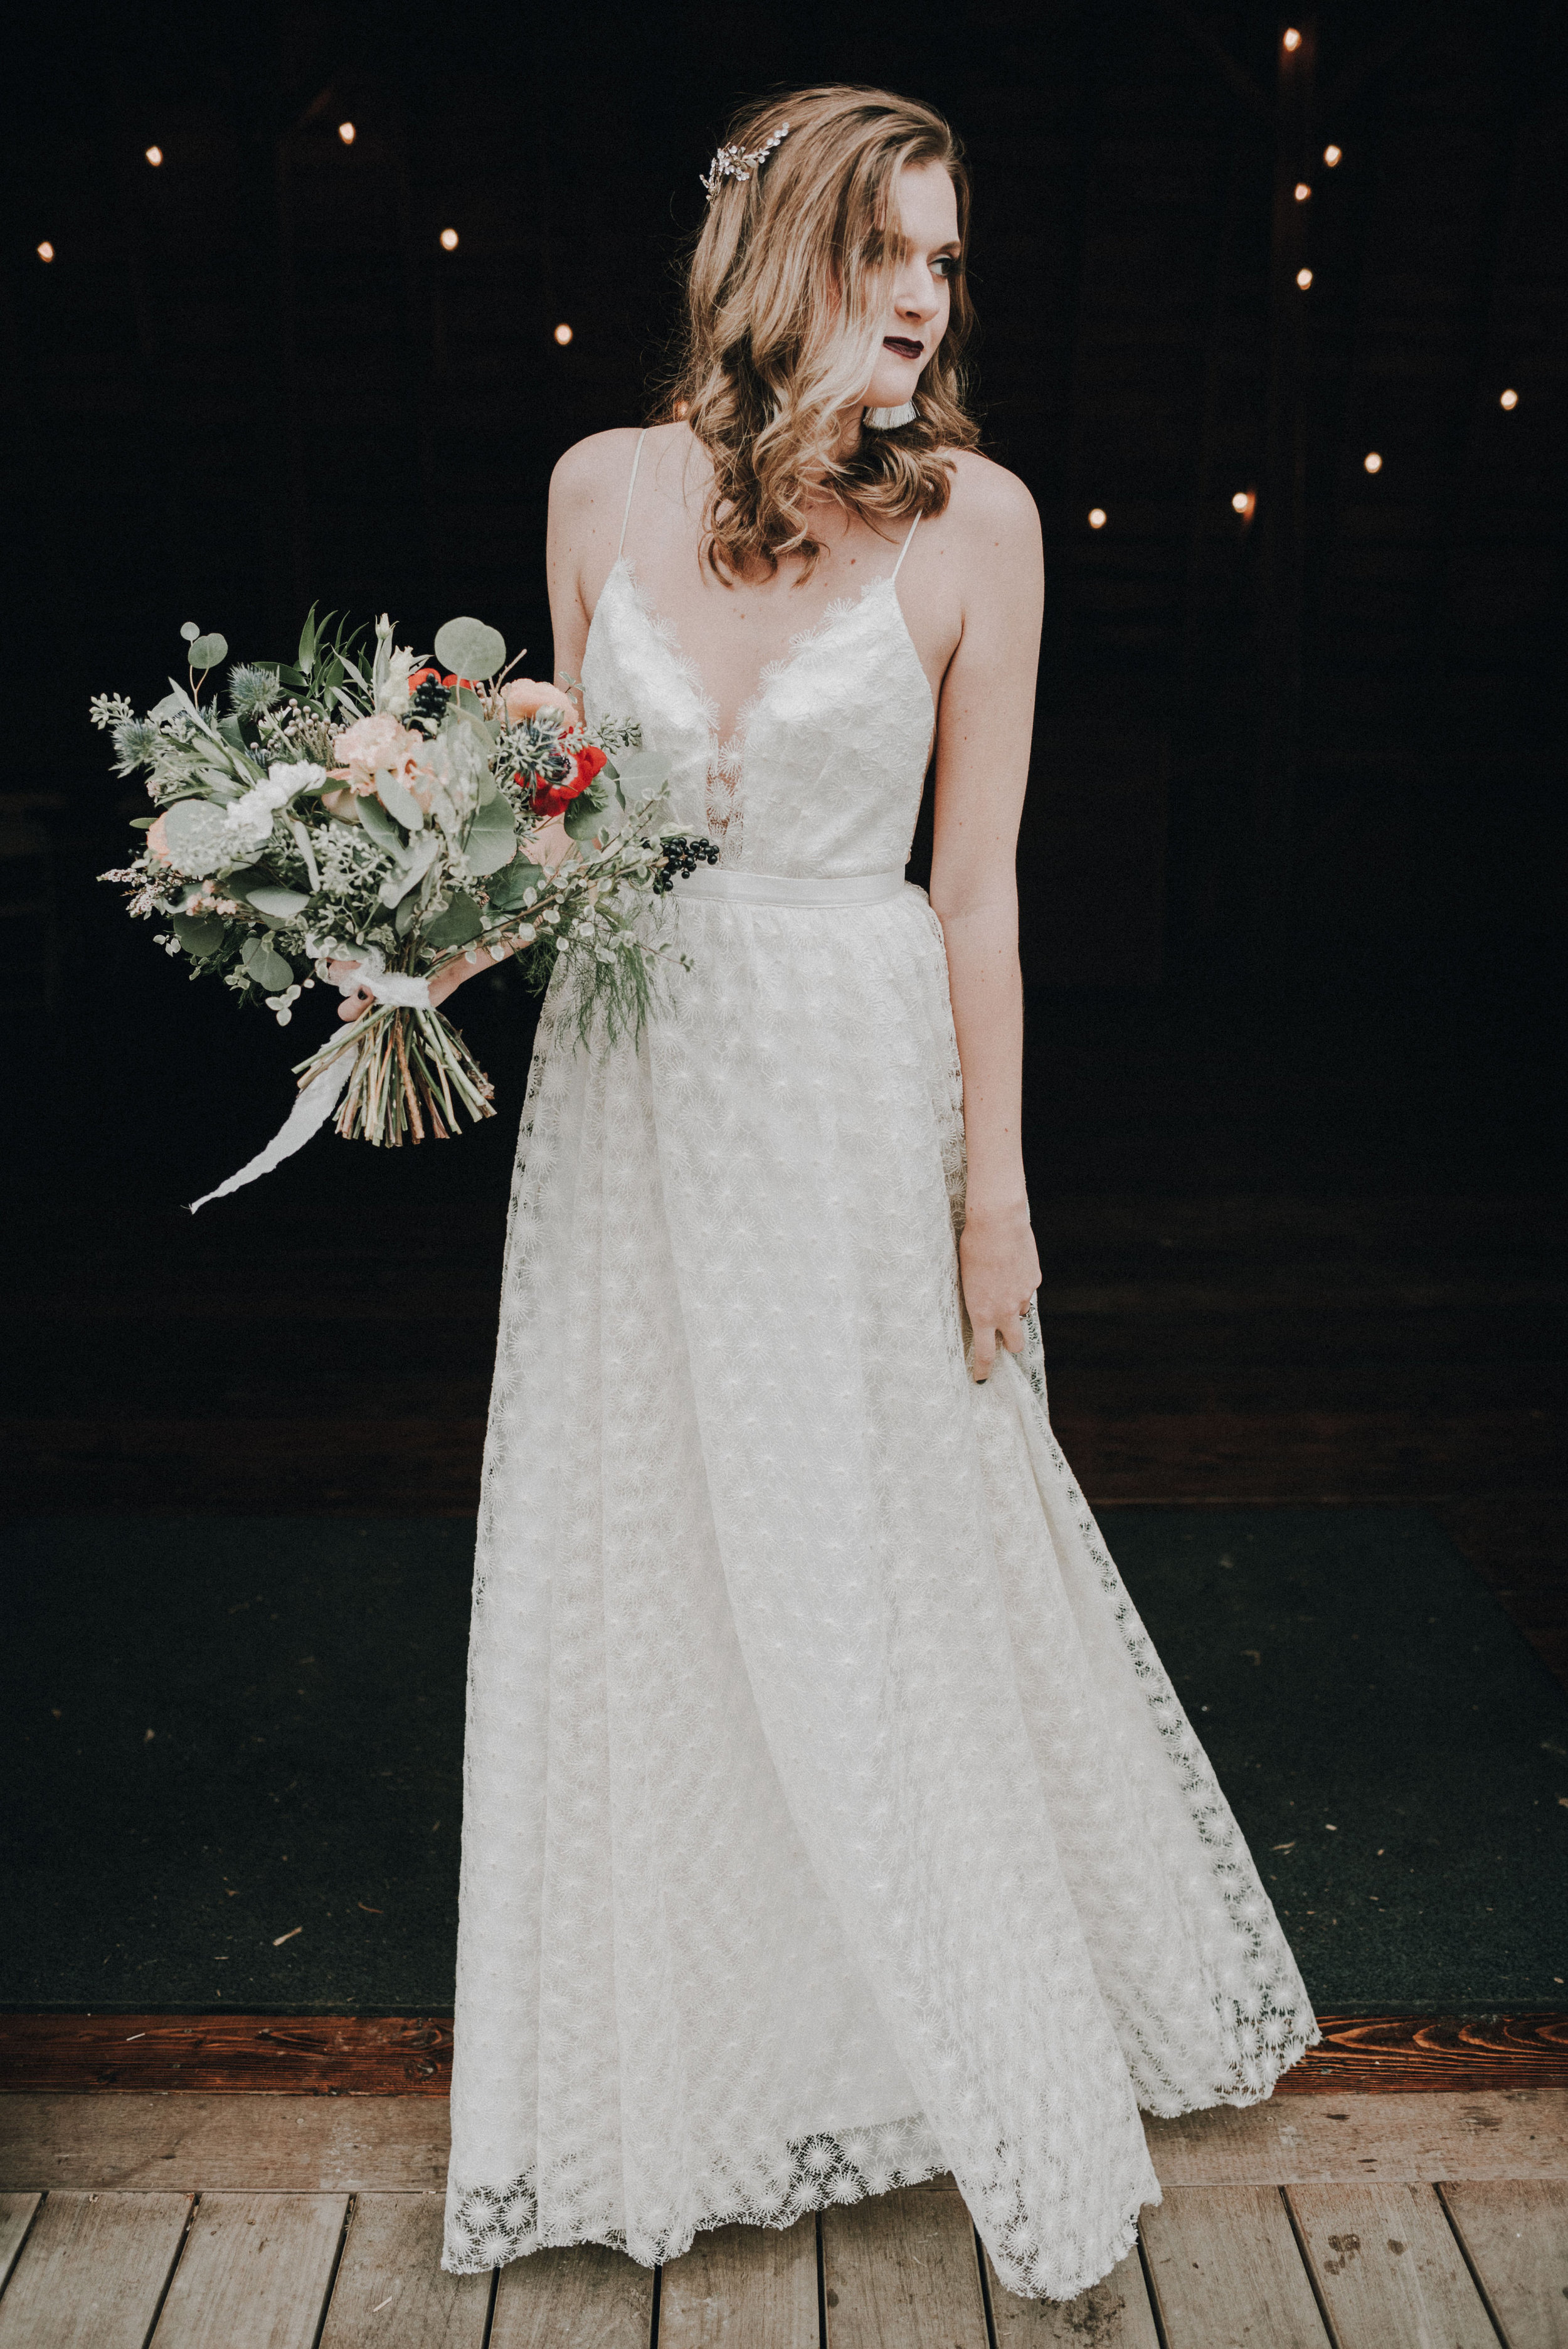 Styled Shoot Edits for MN Bride-MN Bride Edits-0016.jpg